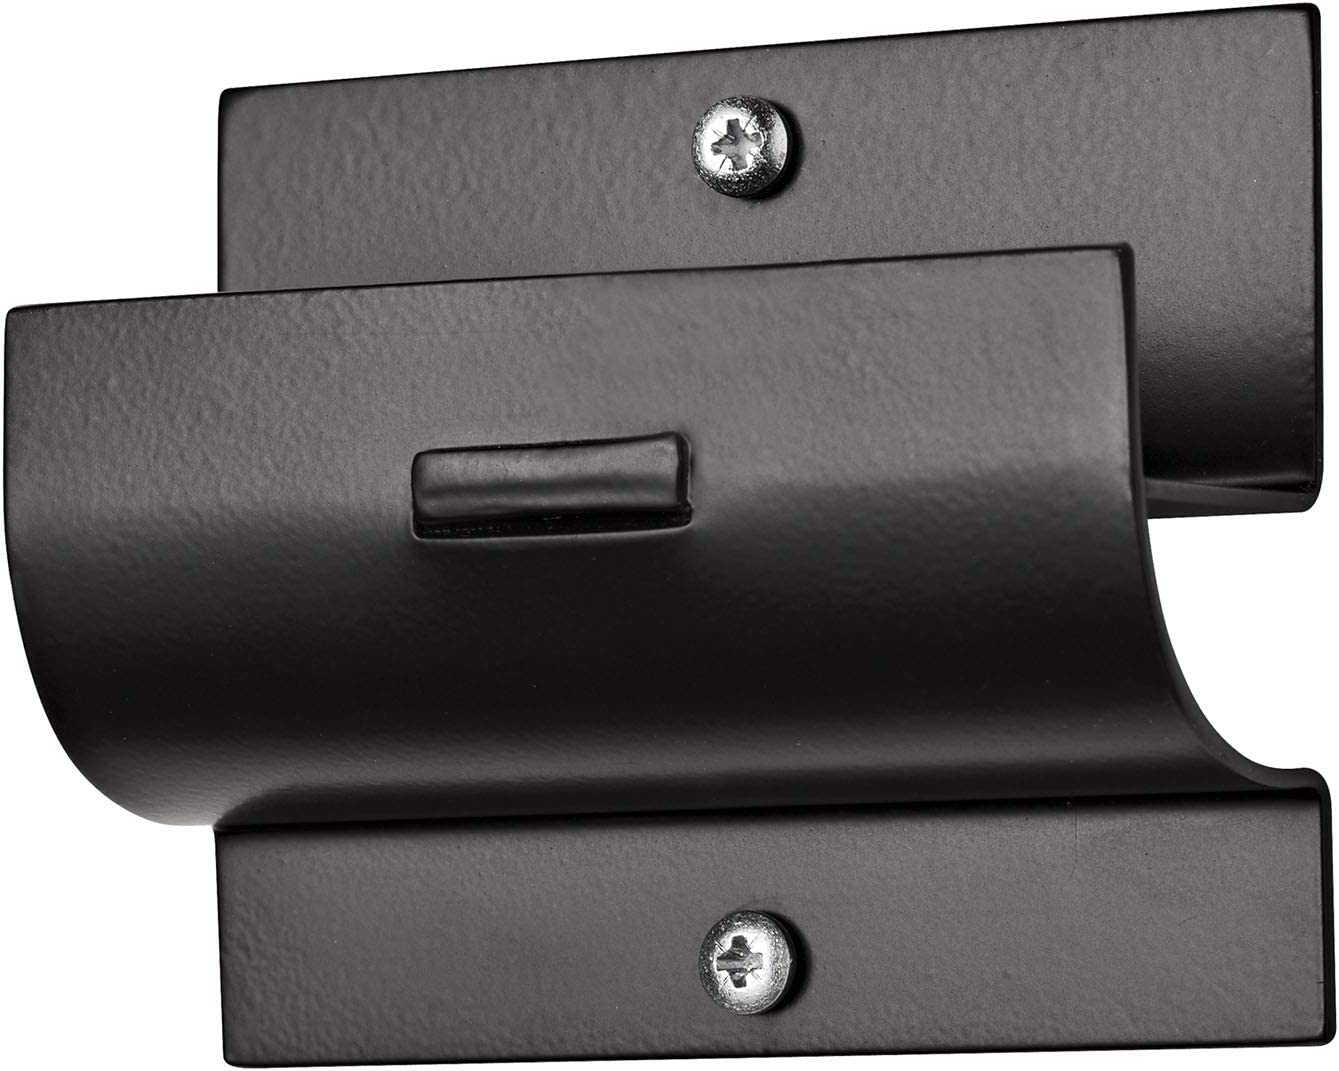 Racor - PSM-1R, Ladder Hook, Wheelbarrow Hanger - Utility Hooks -